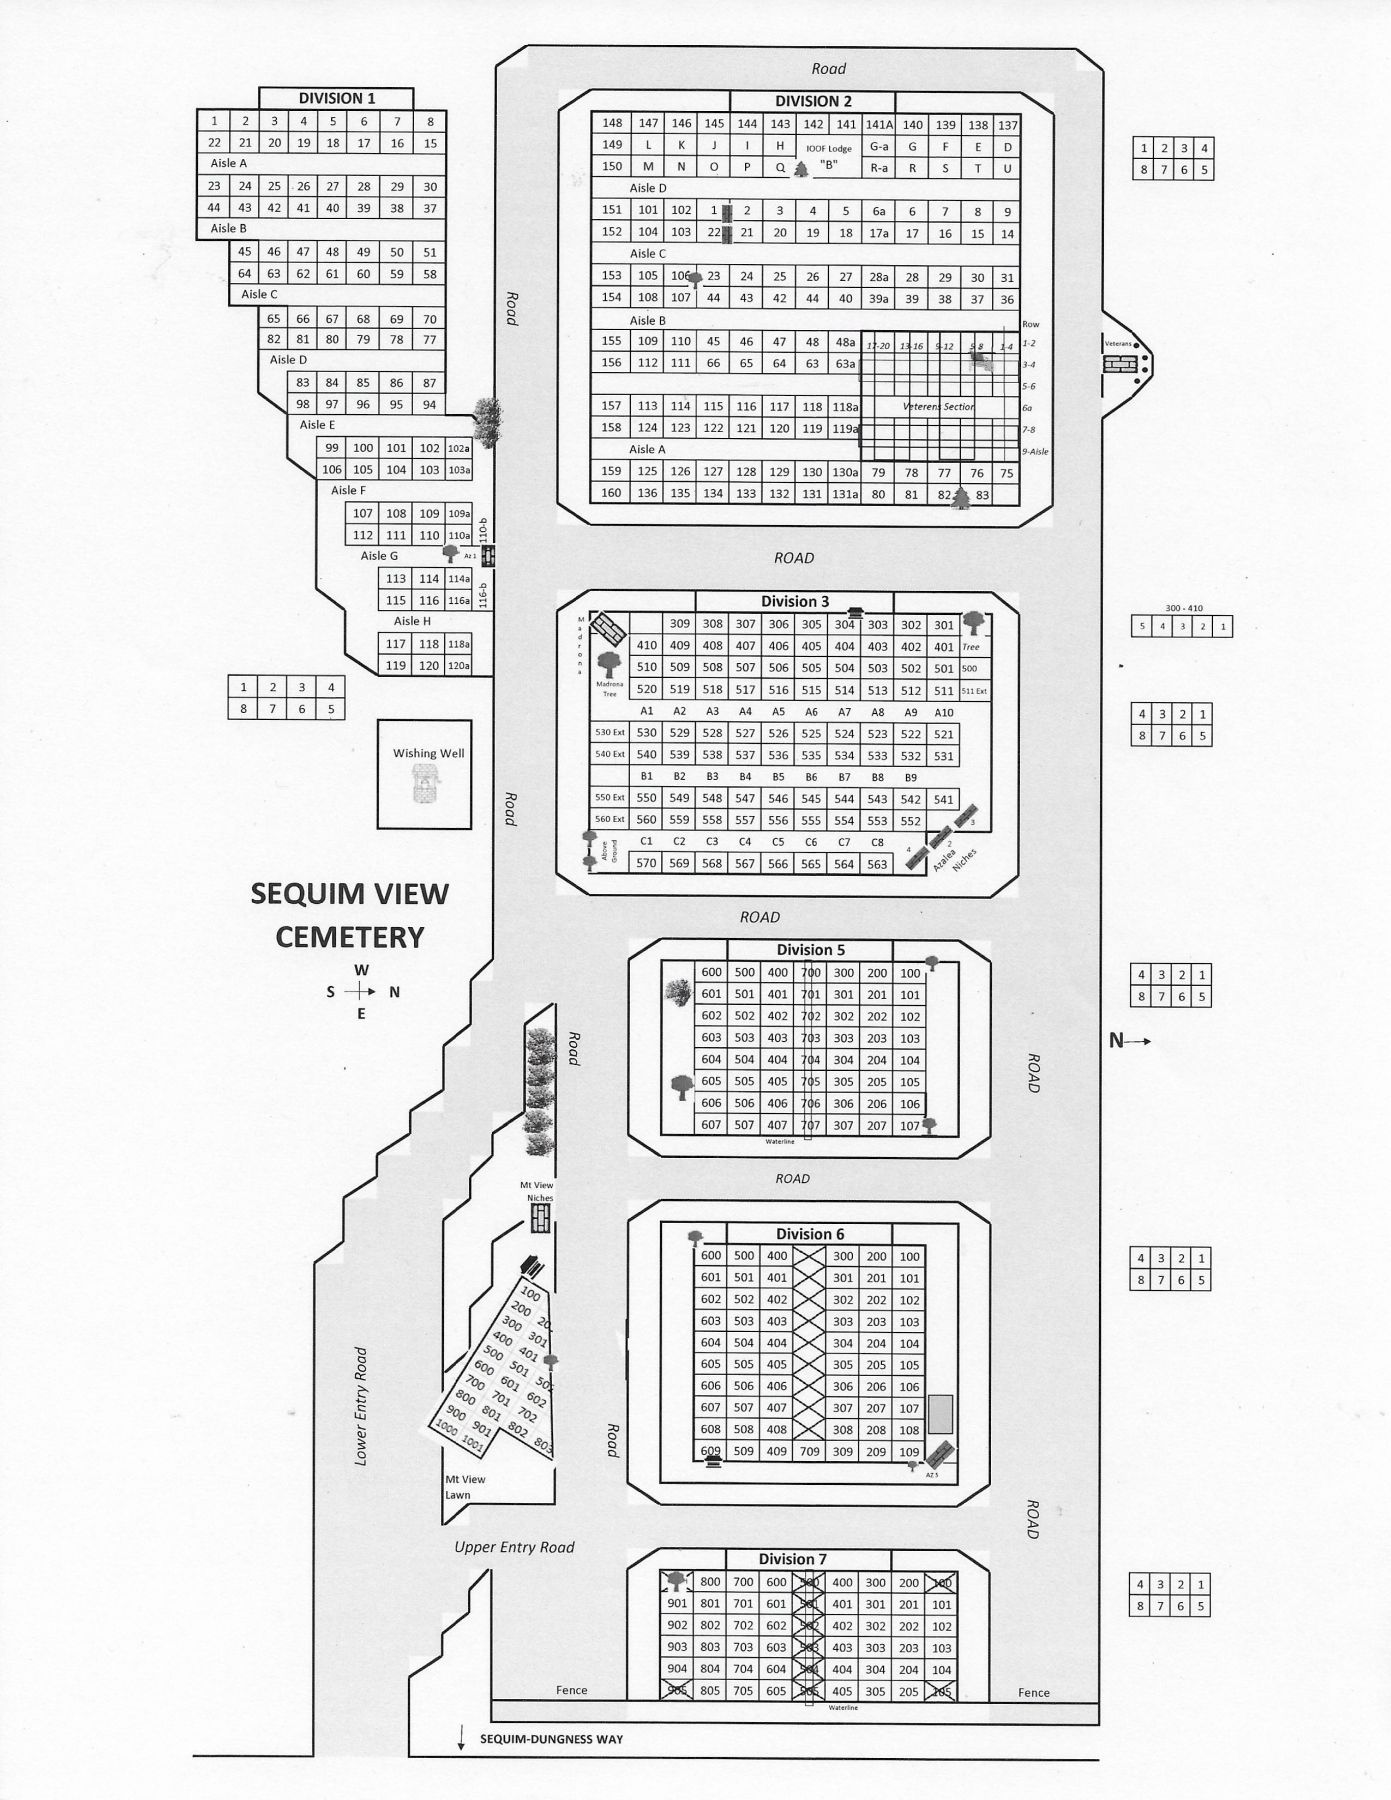 Sequim Zip Code Map.Sequim View Cemetery In Sequim Washington Find A Grave Cemetery